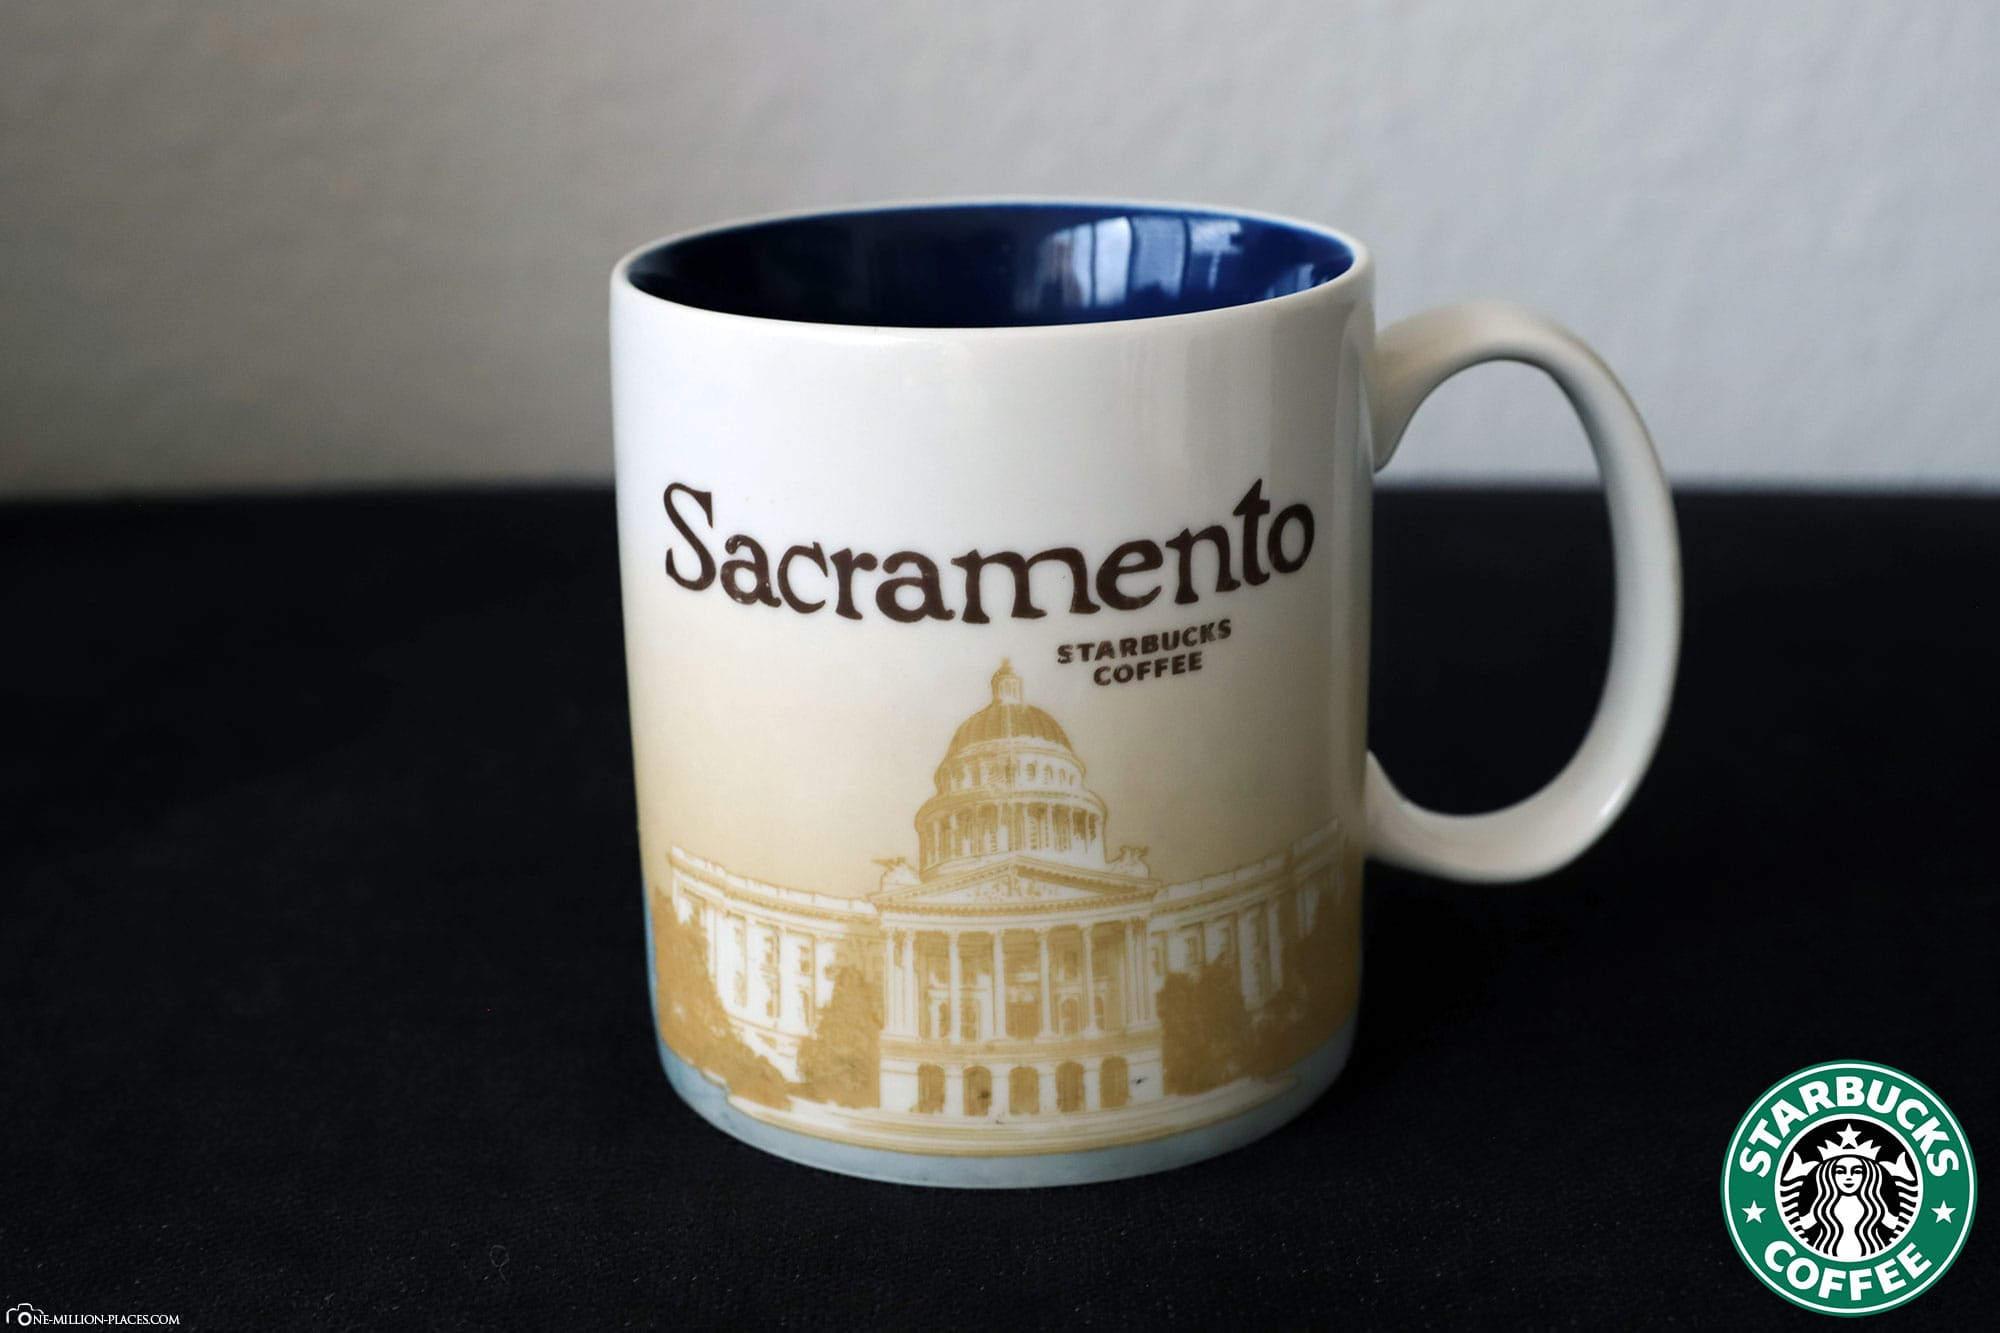 Sacramento, Starbucks Tasse, Global Icon Serie, City Mugs, Sammlung, USA, Reisebericht